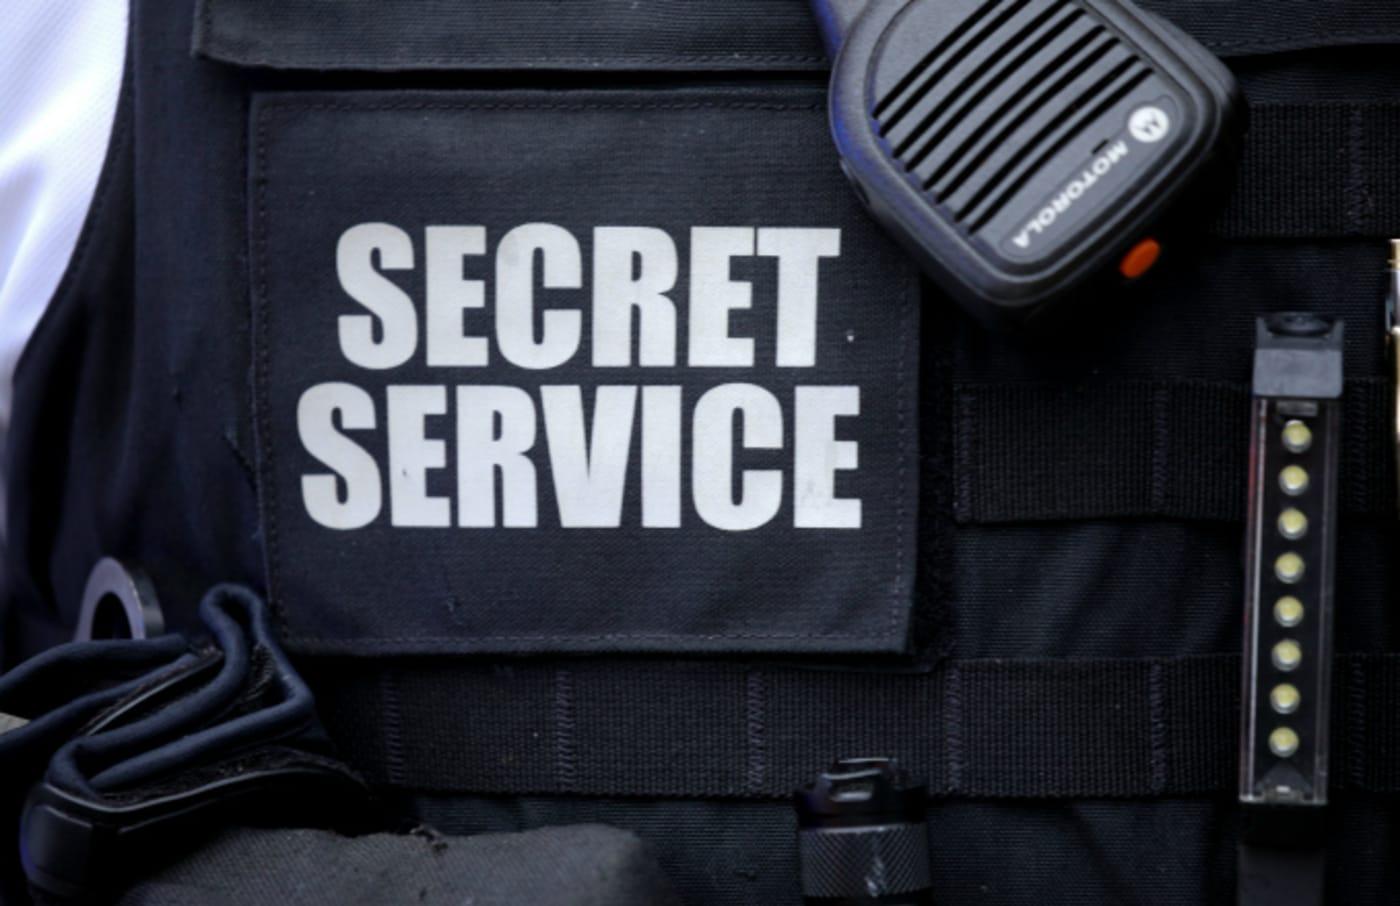 Secret Service Uniformed Division personnel take measures